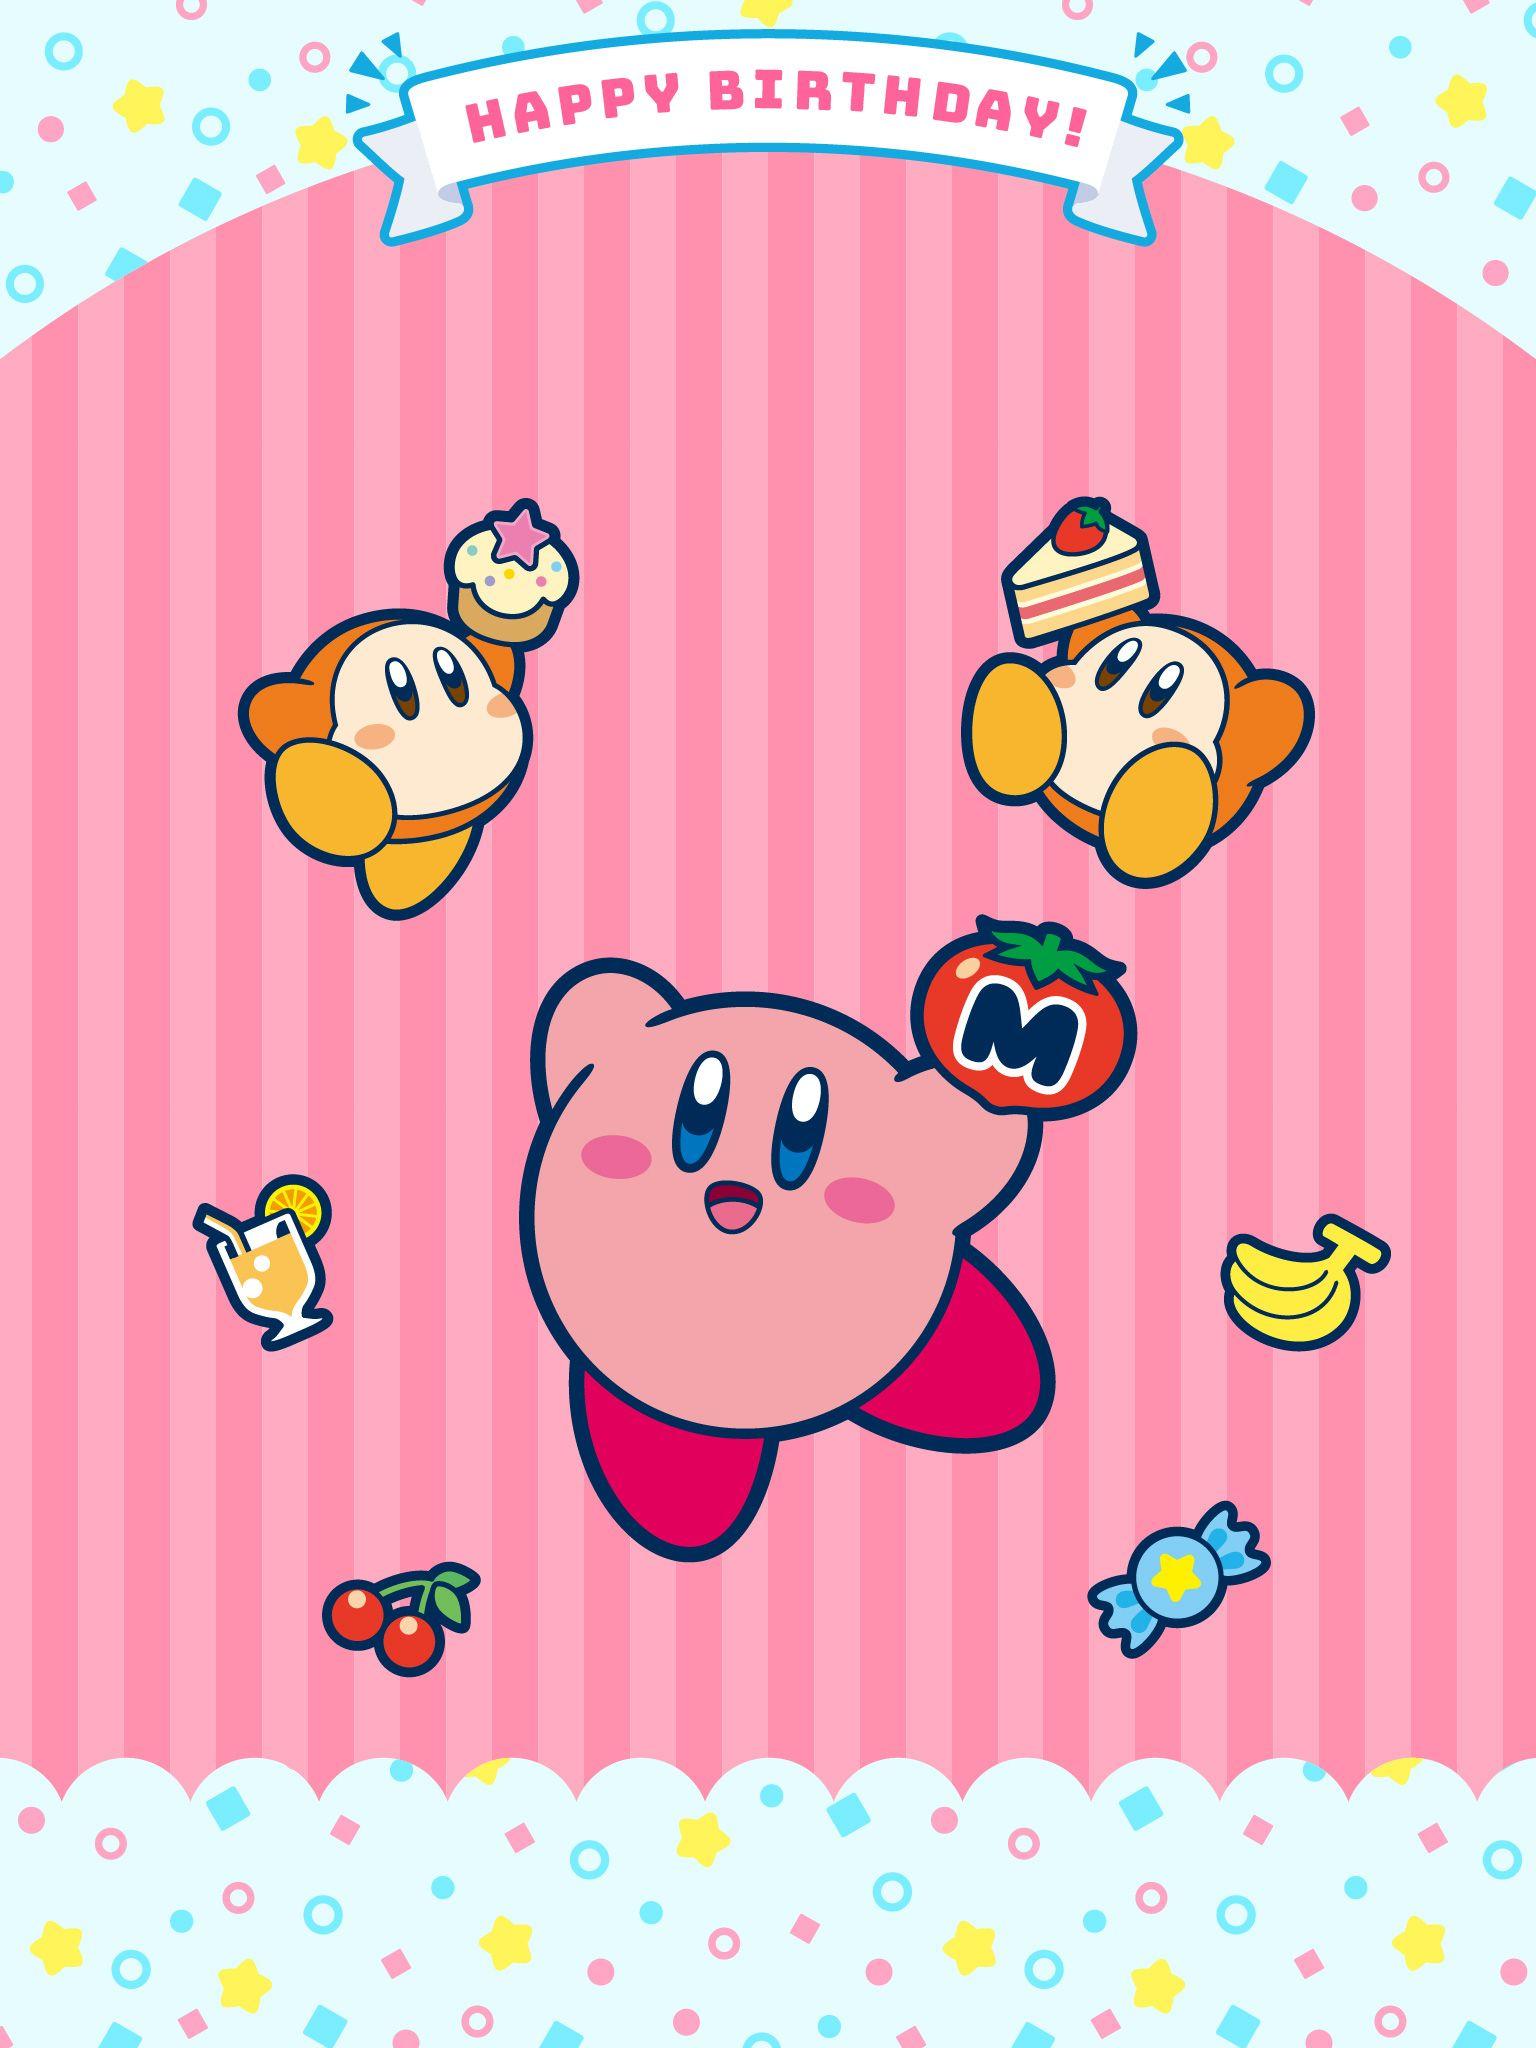 2018 happy birthday Kirby mobile phone wallpaper app